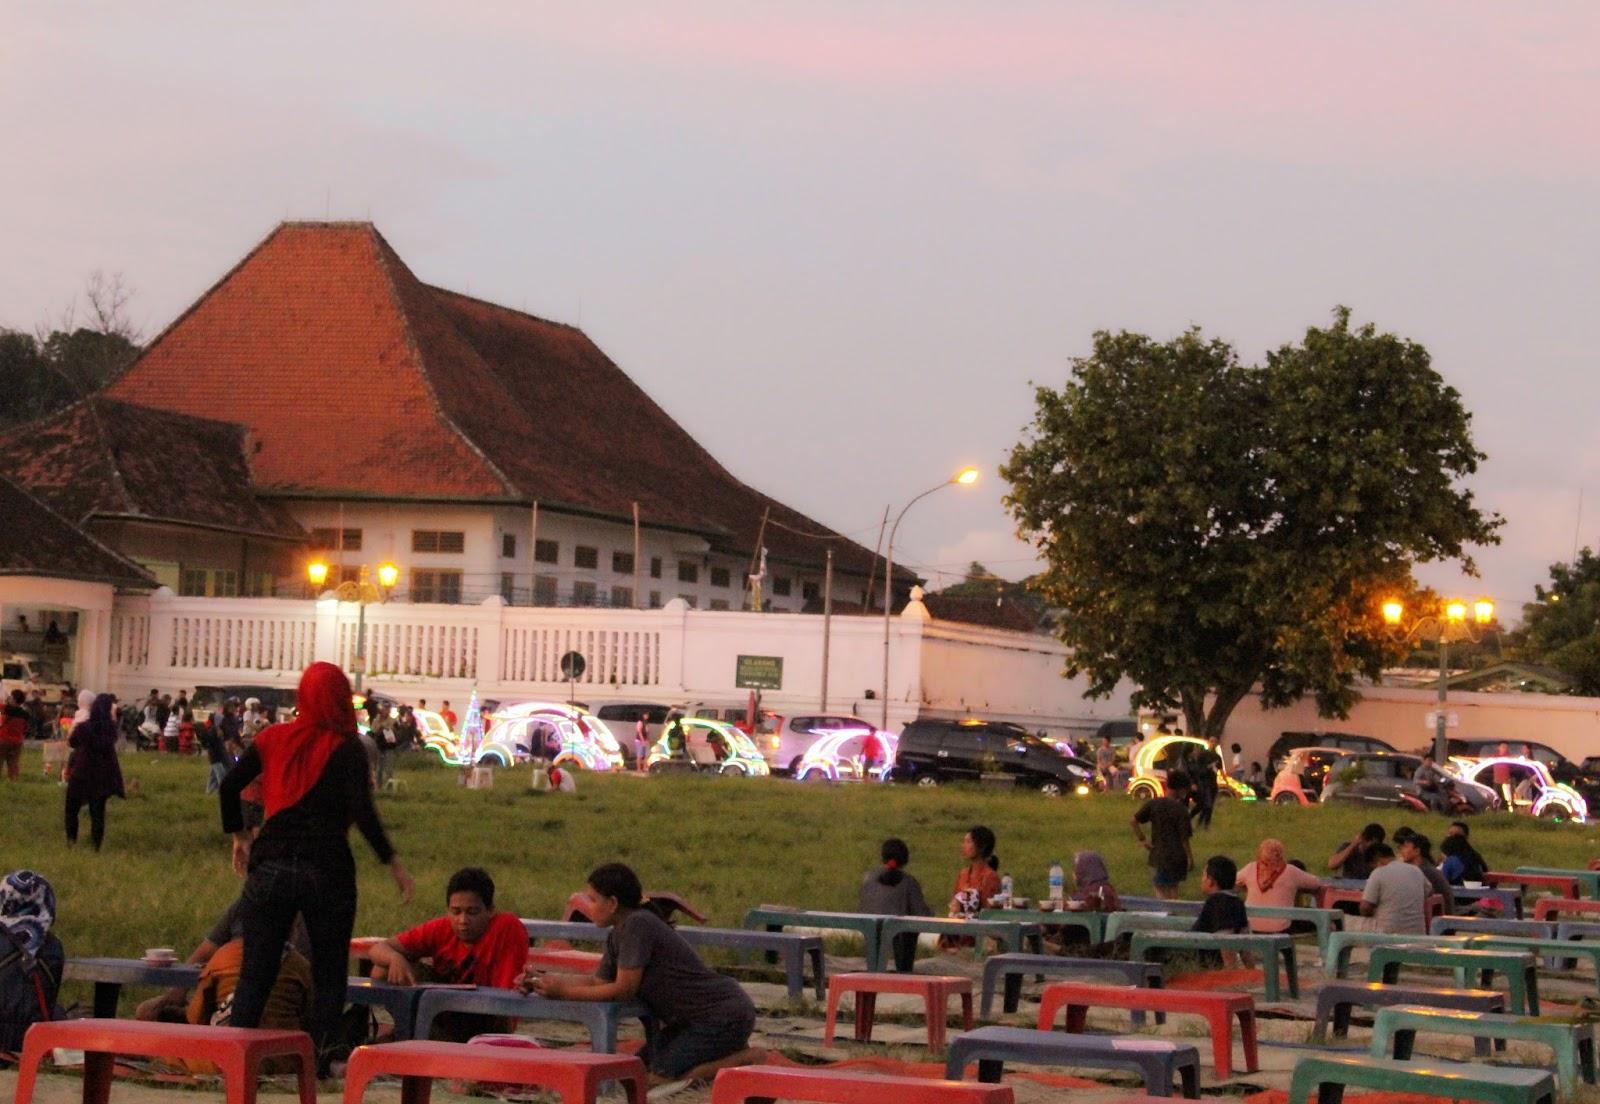 Pemandangan Indah Di Alun-alun Kidul Yogyakarta